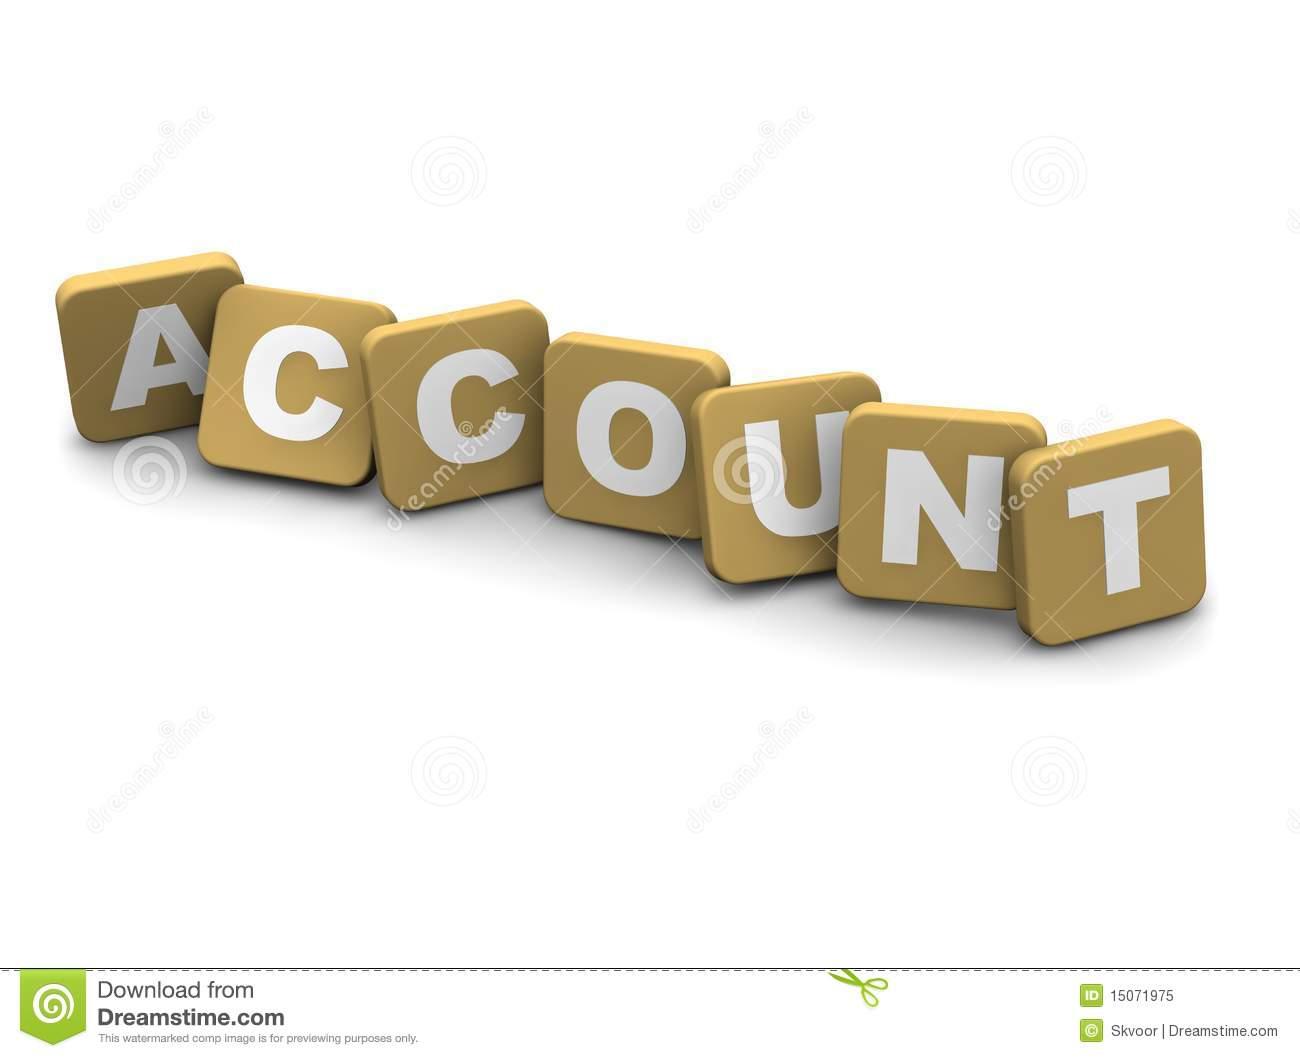 Accounting clipart final account. Accountant panda free images